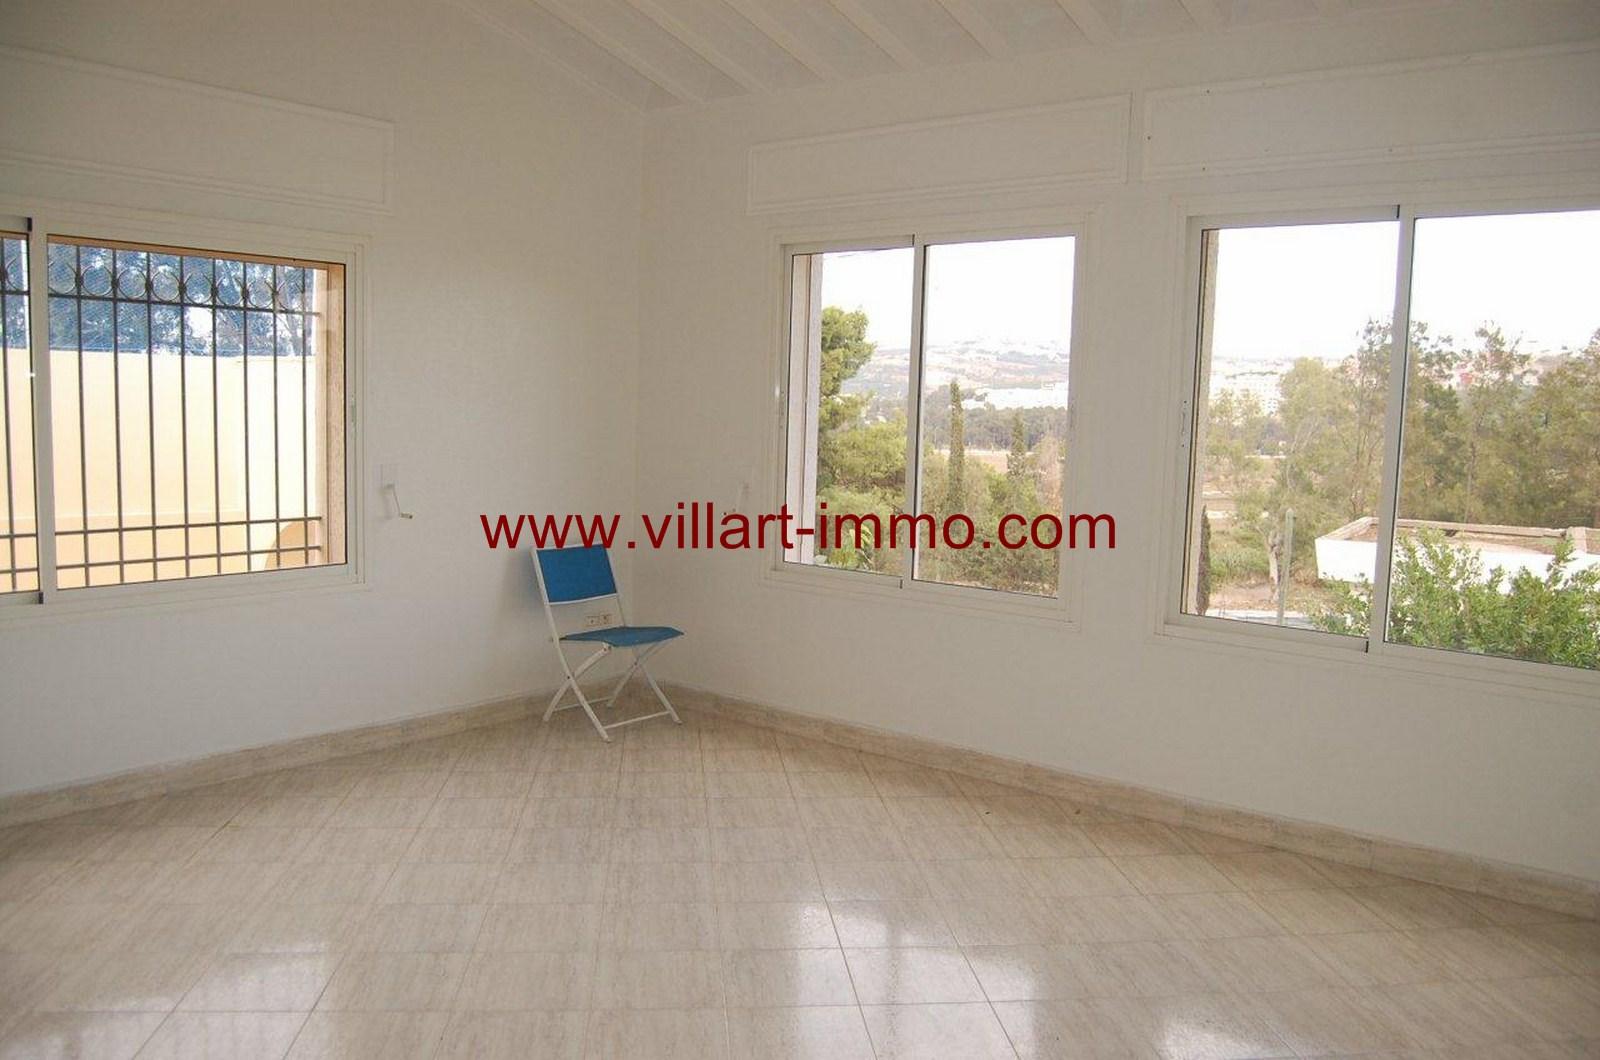 7-vente-villa-tanger-malabata-chambre-1-va362-villart-immo